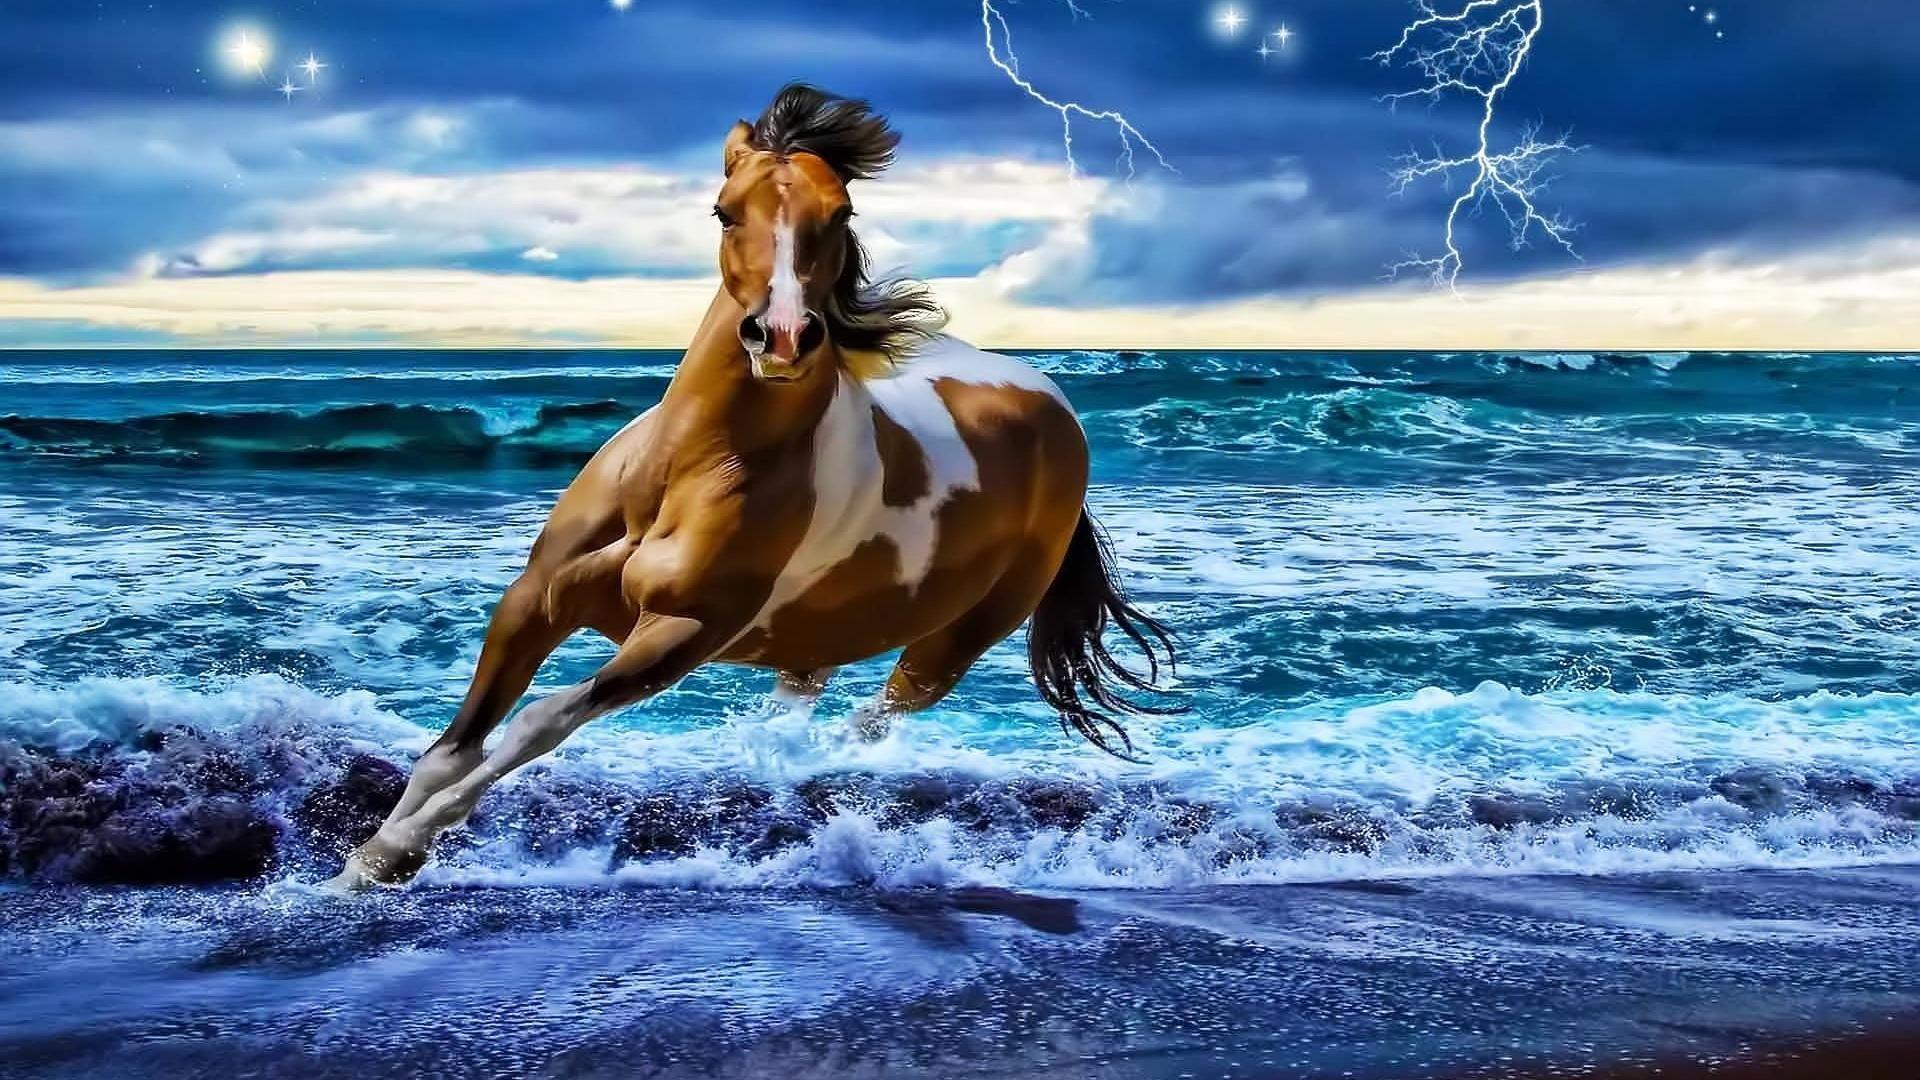 Most Inspiring Wallpaper Horse Fantasy - 85215c7a373adb9171e54b9fcd1558eb  Collection_715079.jpg